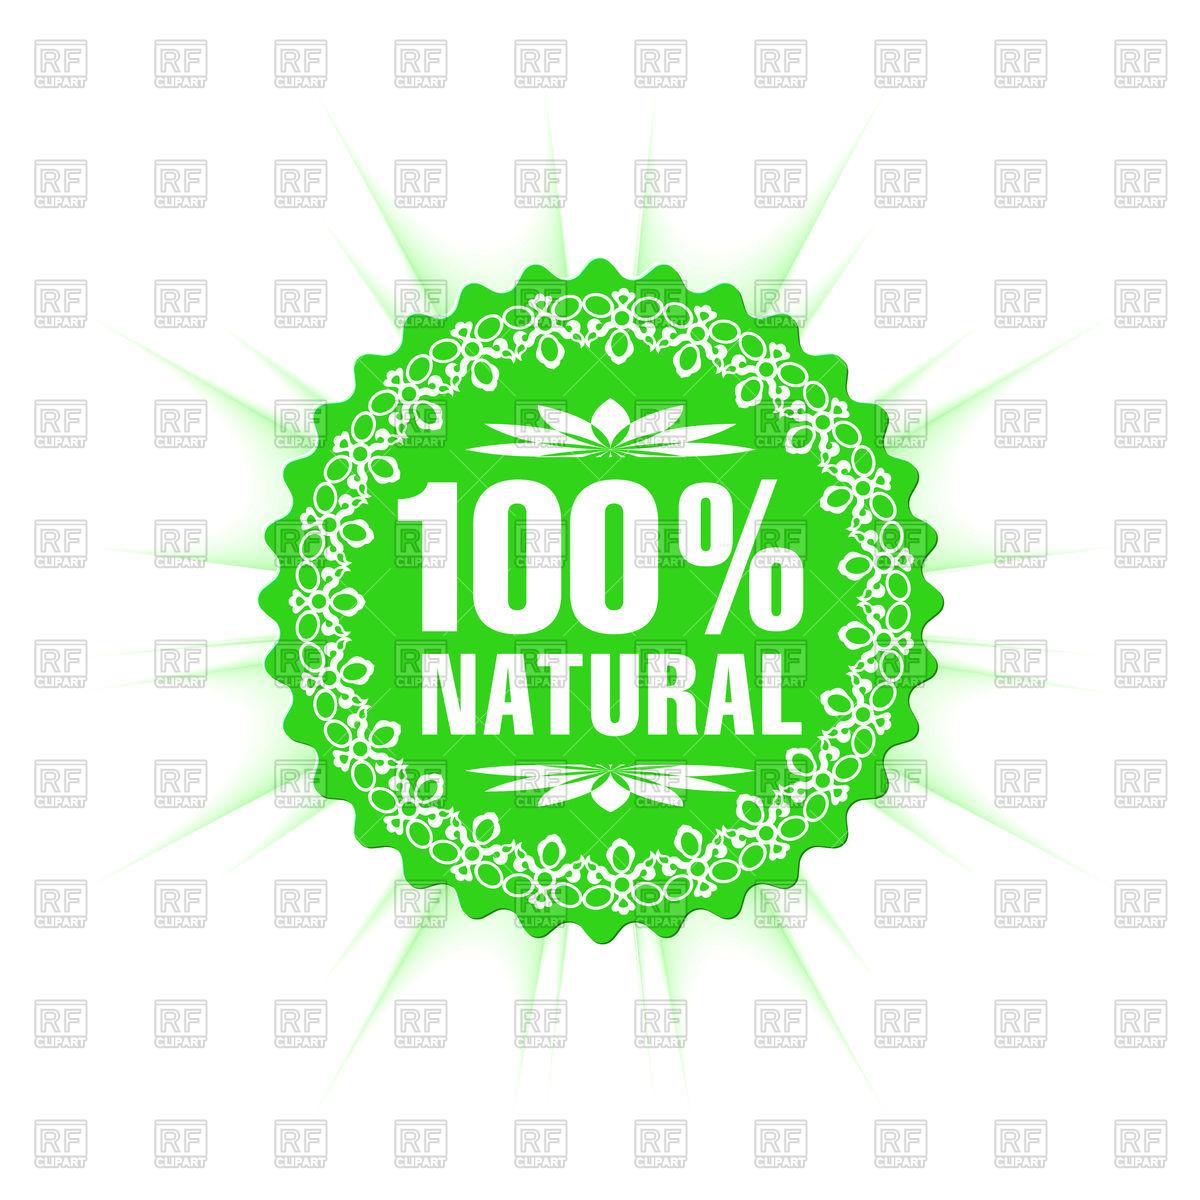 1200x1200 100% Natural Guarantee Label Vector Image Vector Artwork Of